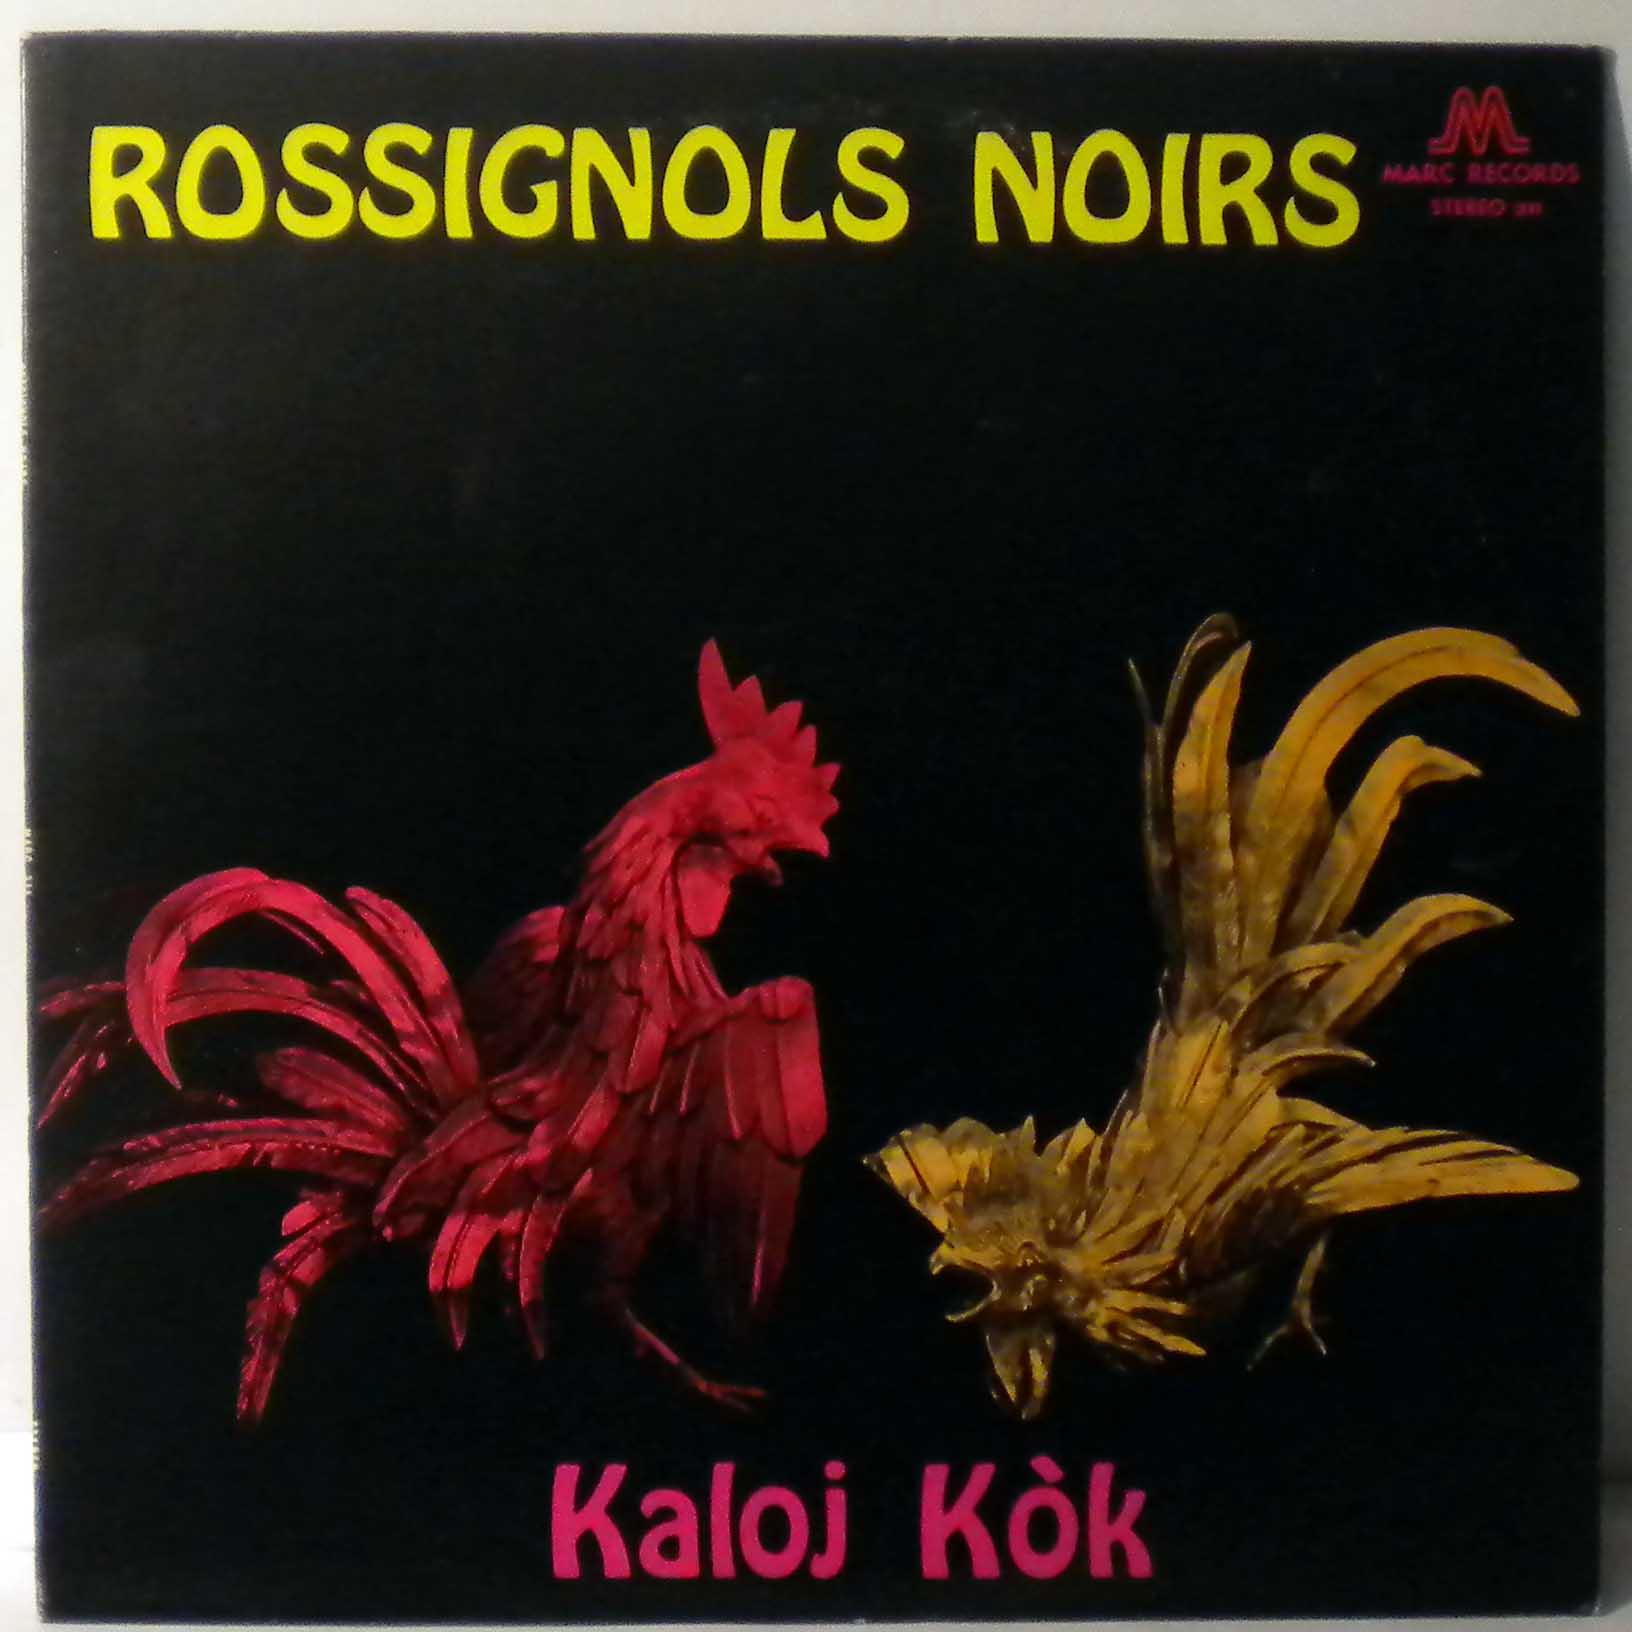 ROSSIGNOLS NOIRS - Kaloj kok - LP